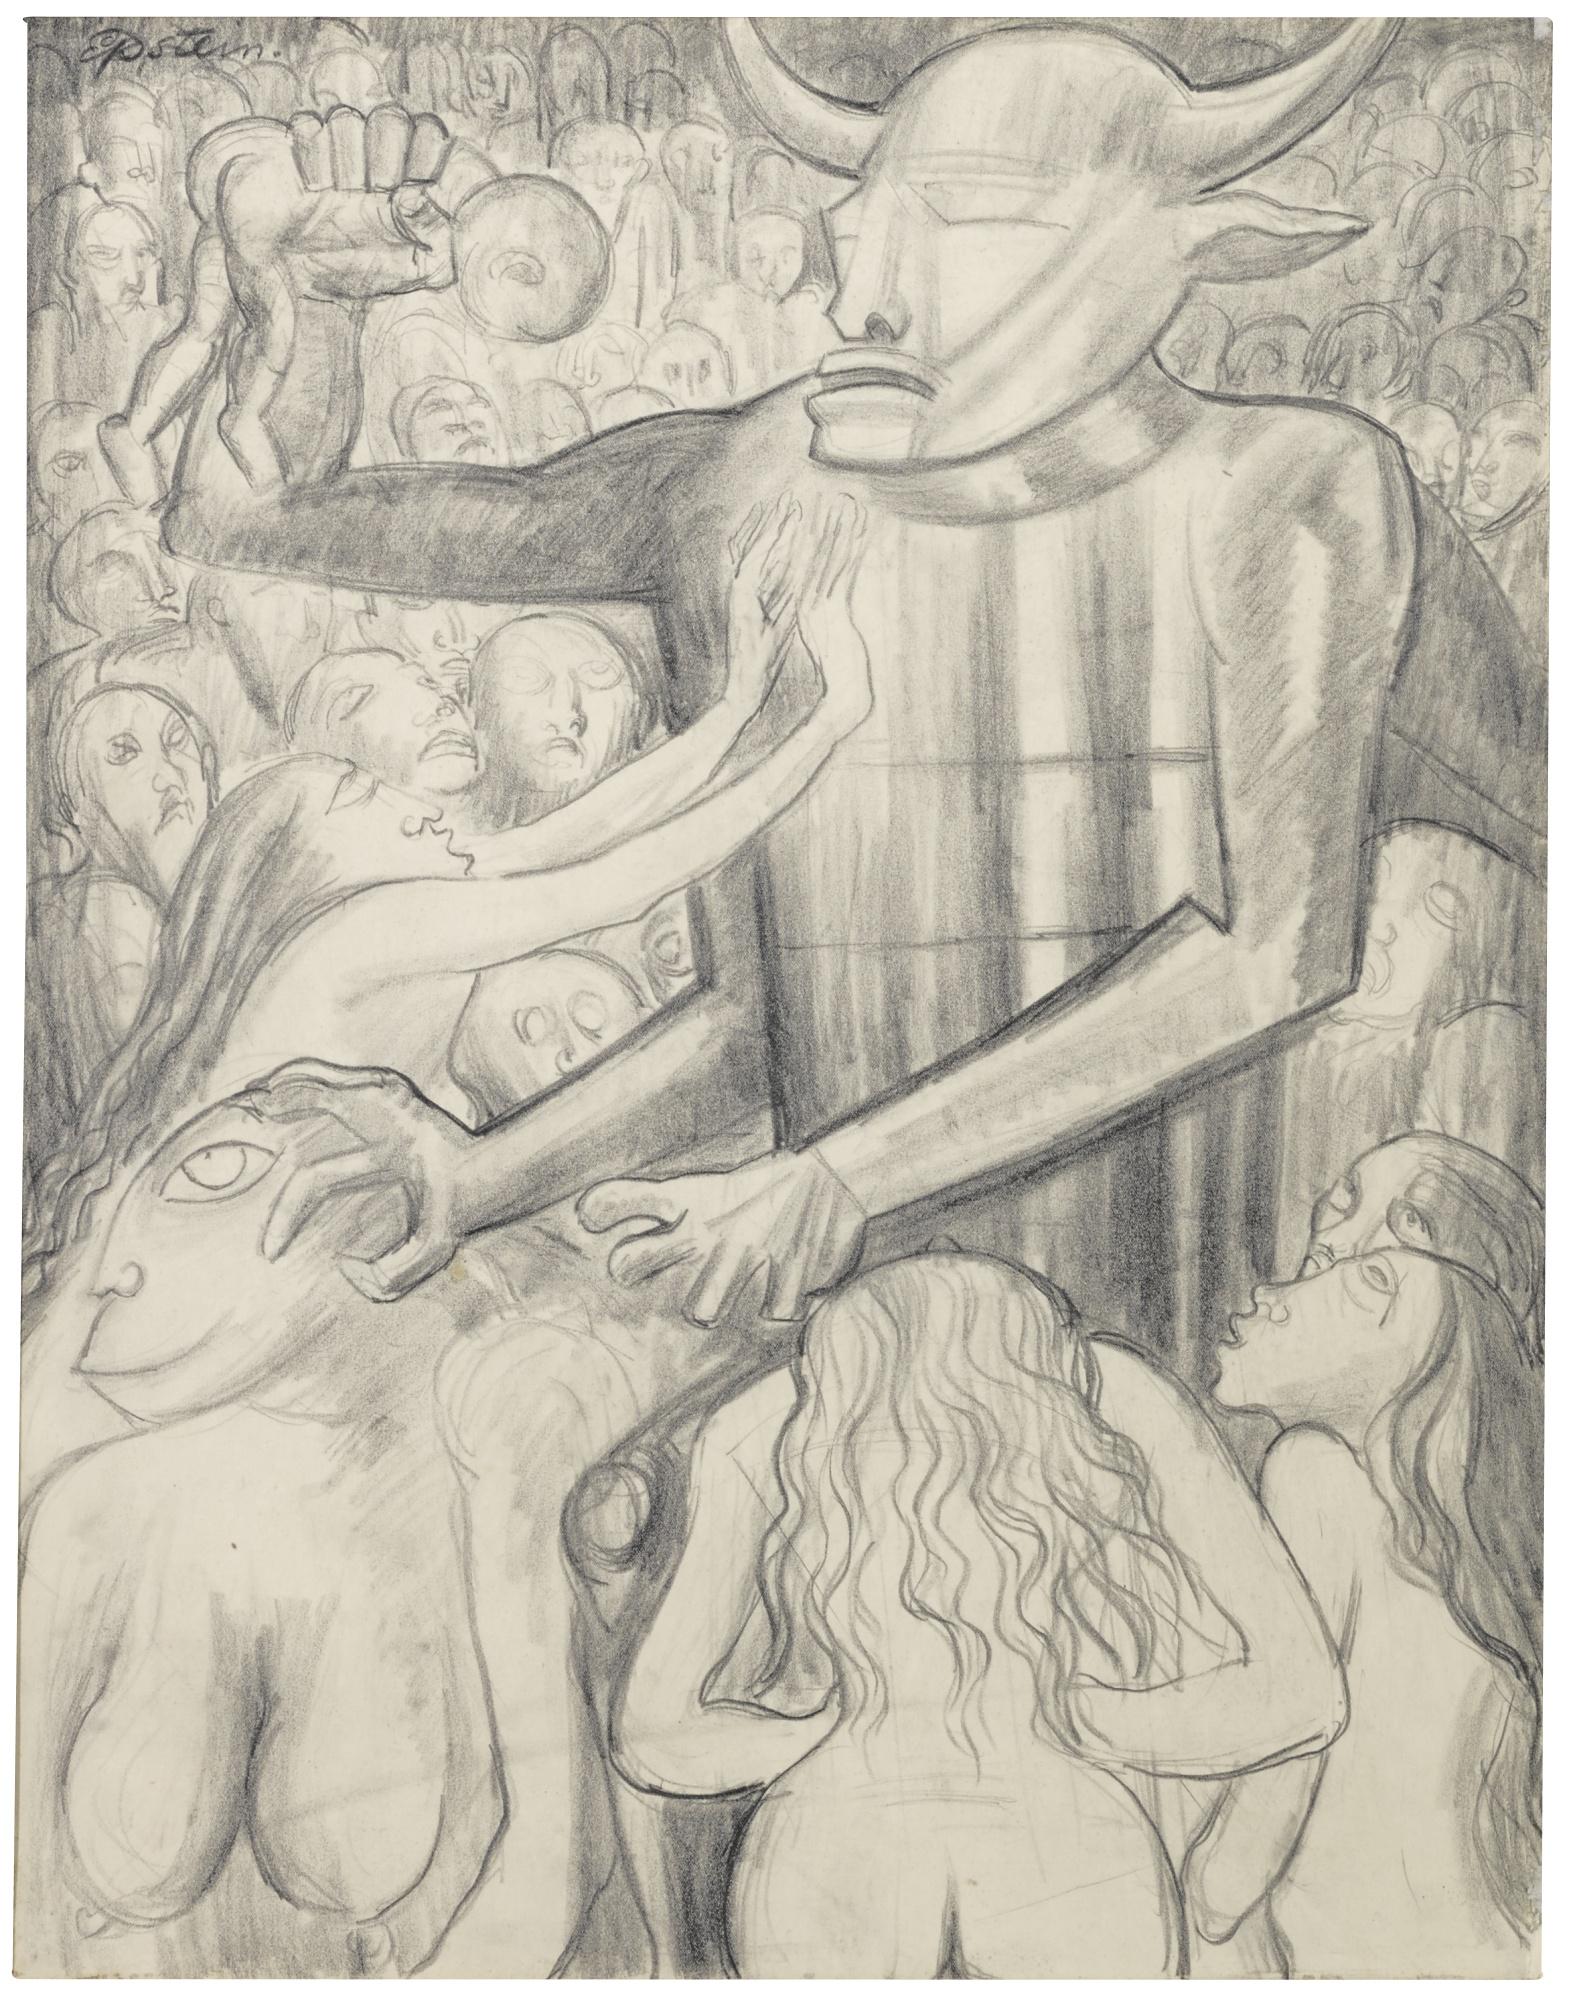 Jacob Epstein-Les Fleurs Du Mal - Hymne ALa Beaute-1938